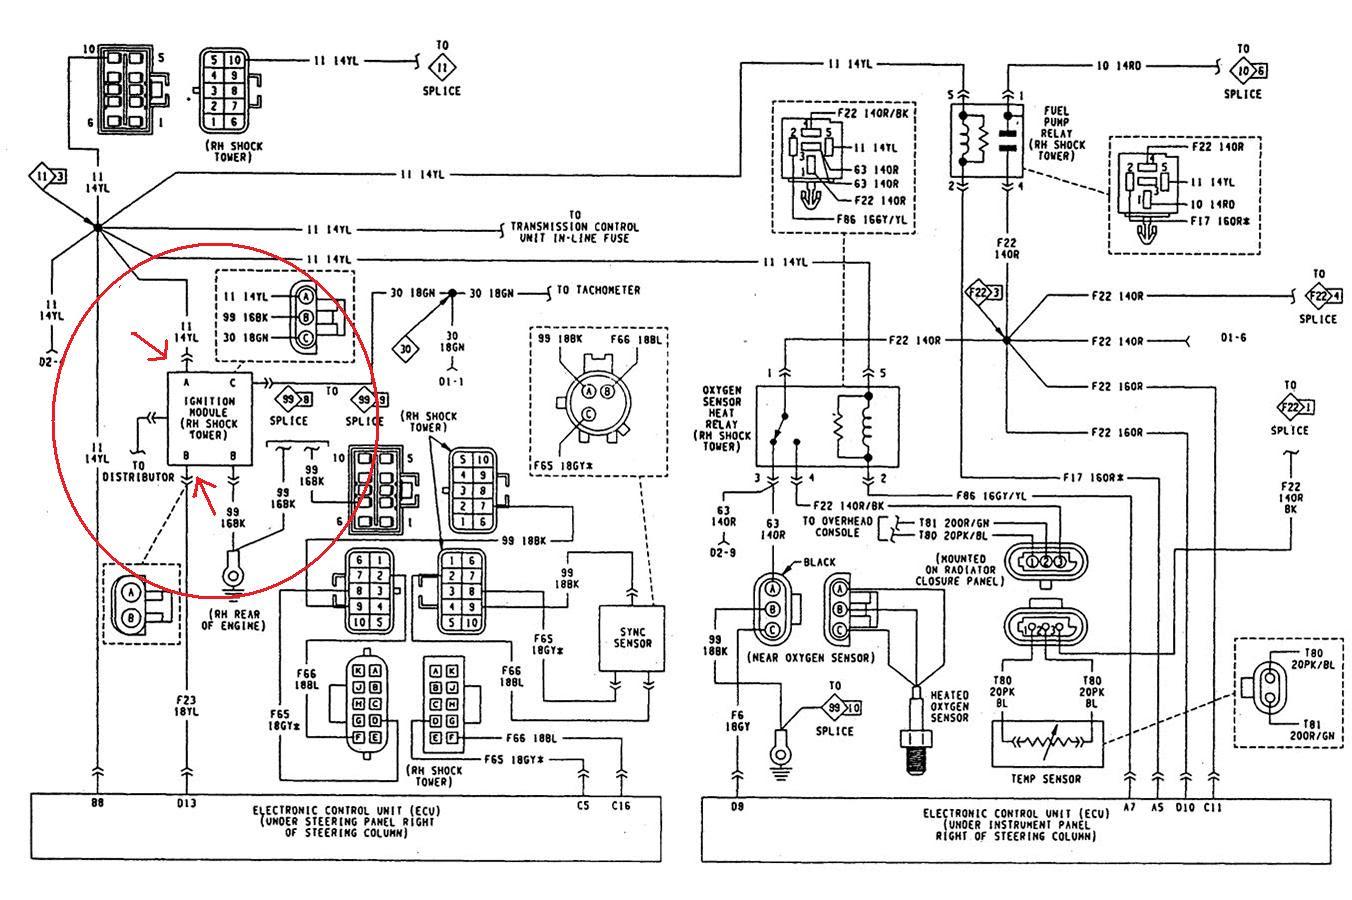 1990 Wiring Diagram Jeep 2000 Ford F350 Sel Fuse Box Diagram 5pin Mbek1 Operazionerestauro It